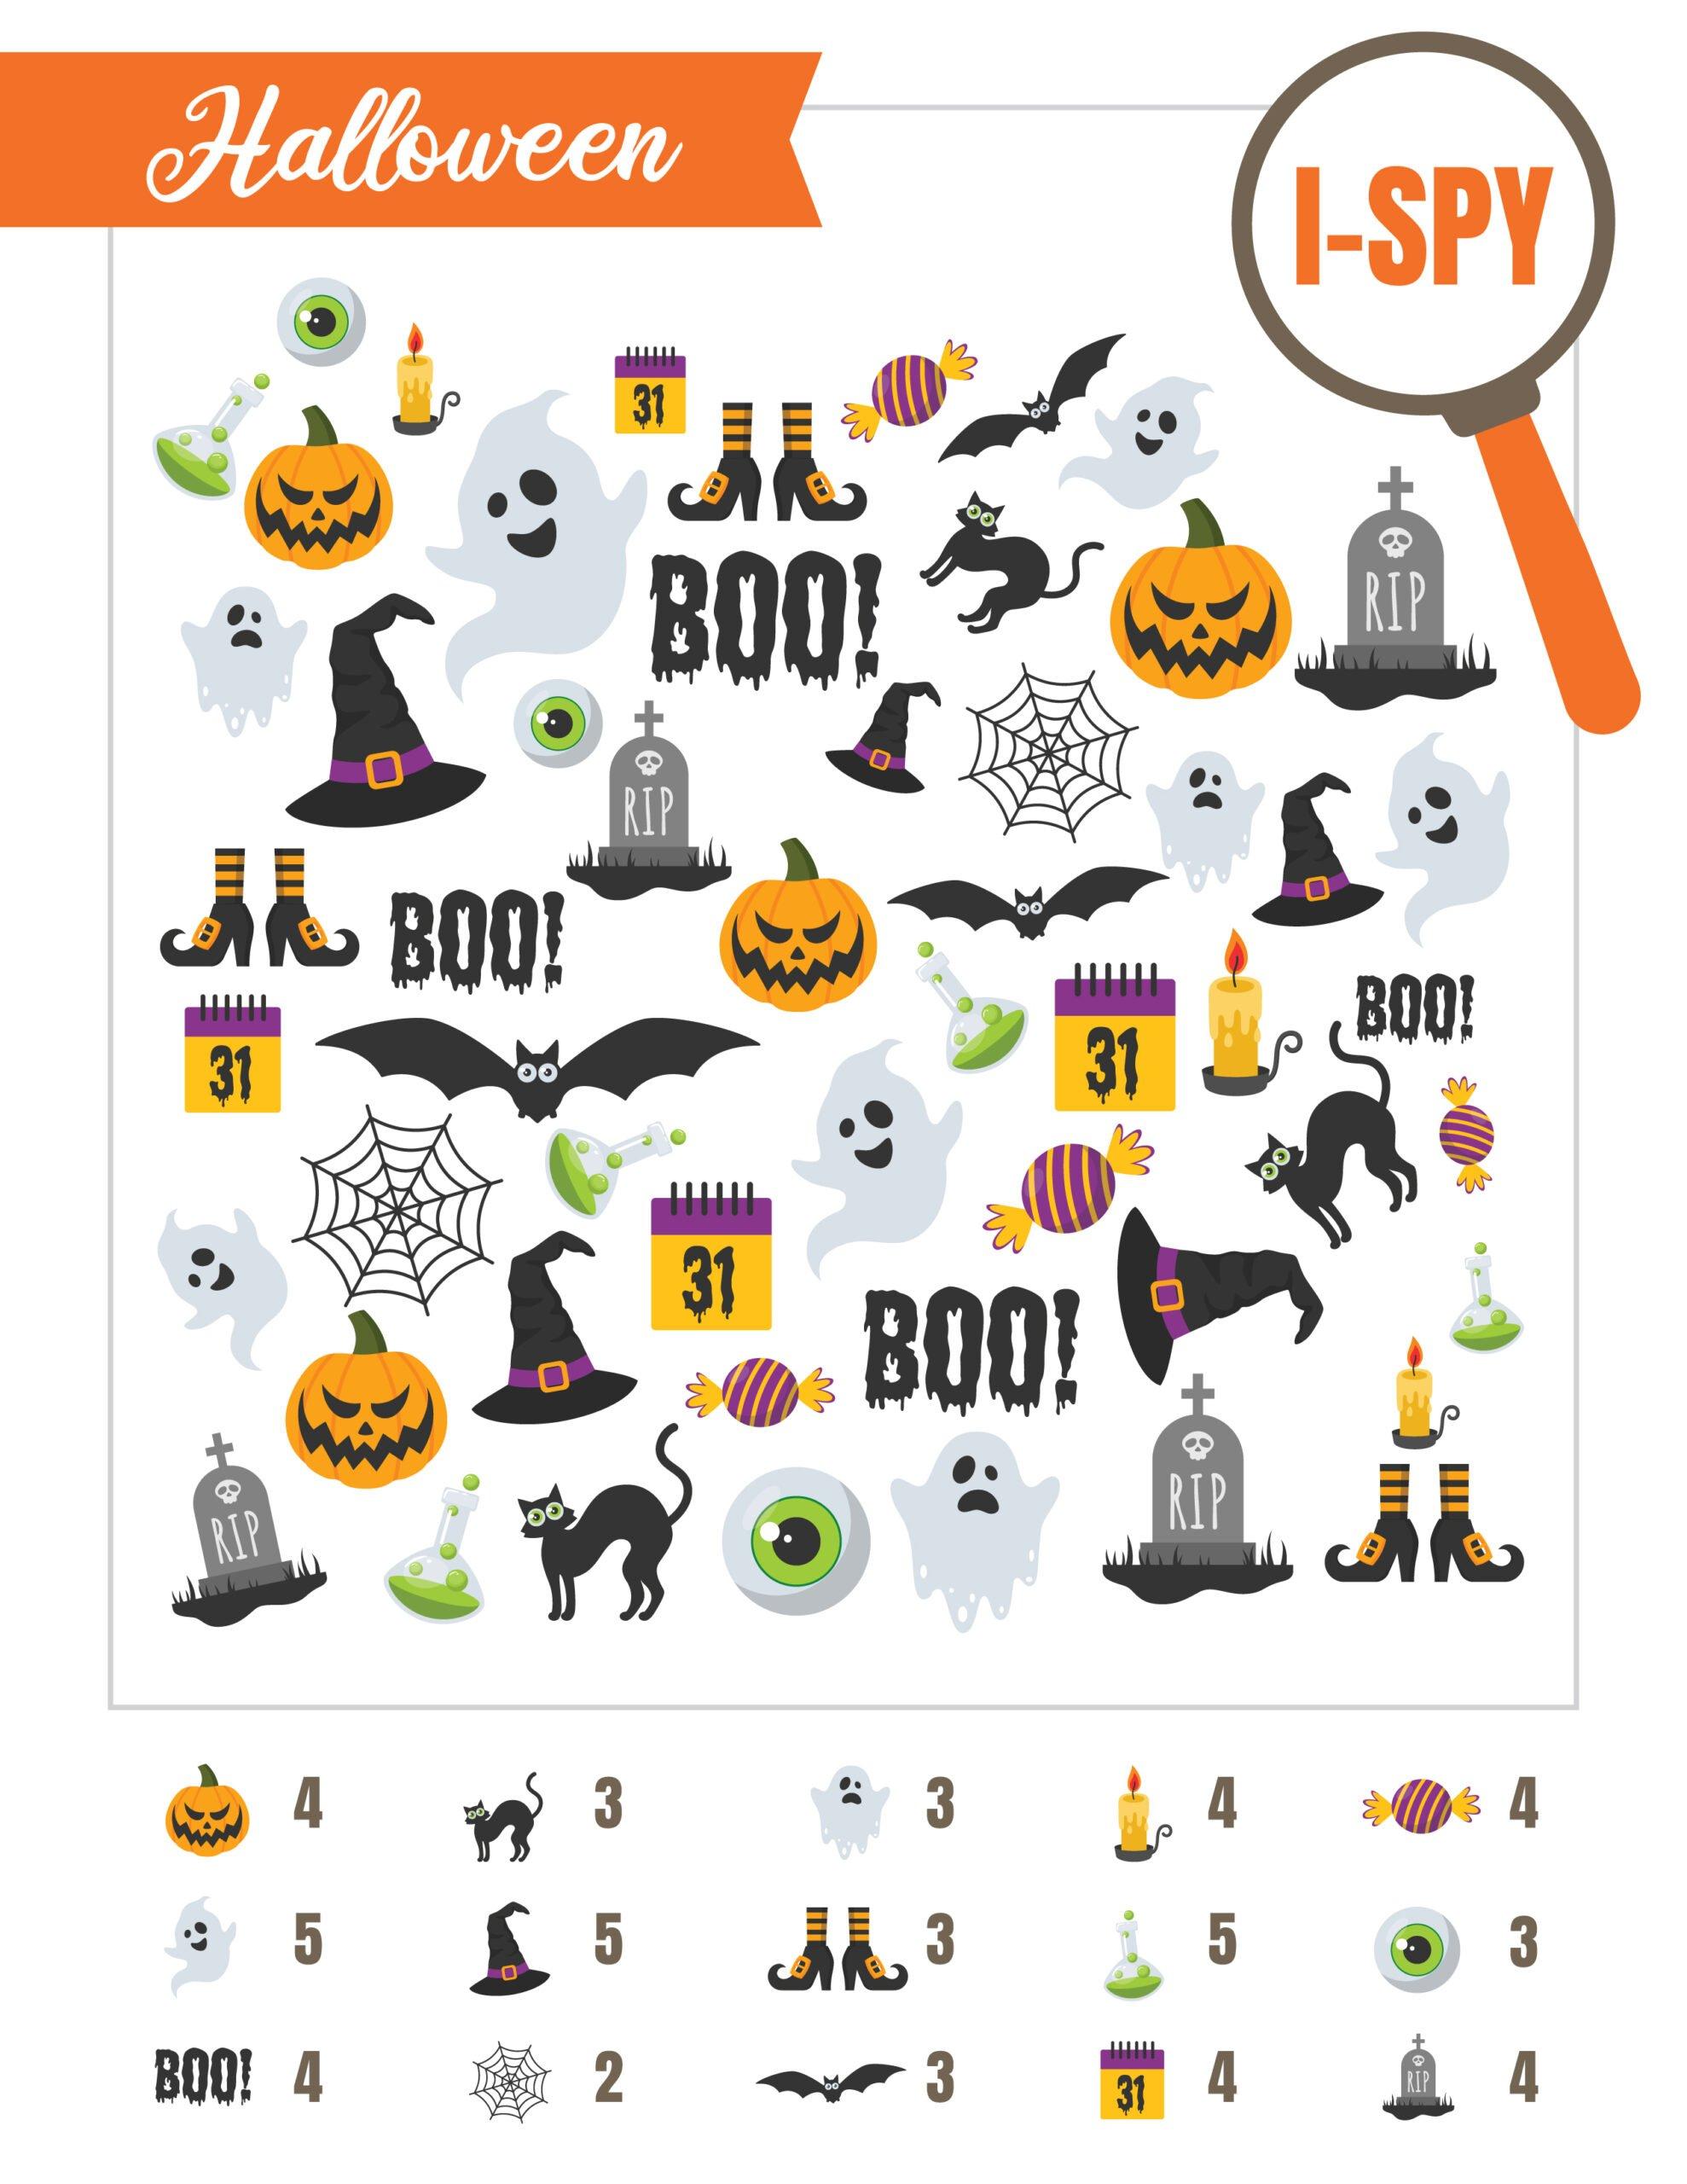 Printable Halloween i-spy sheet